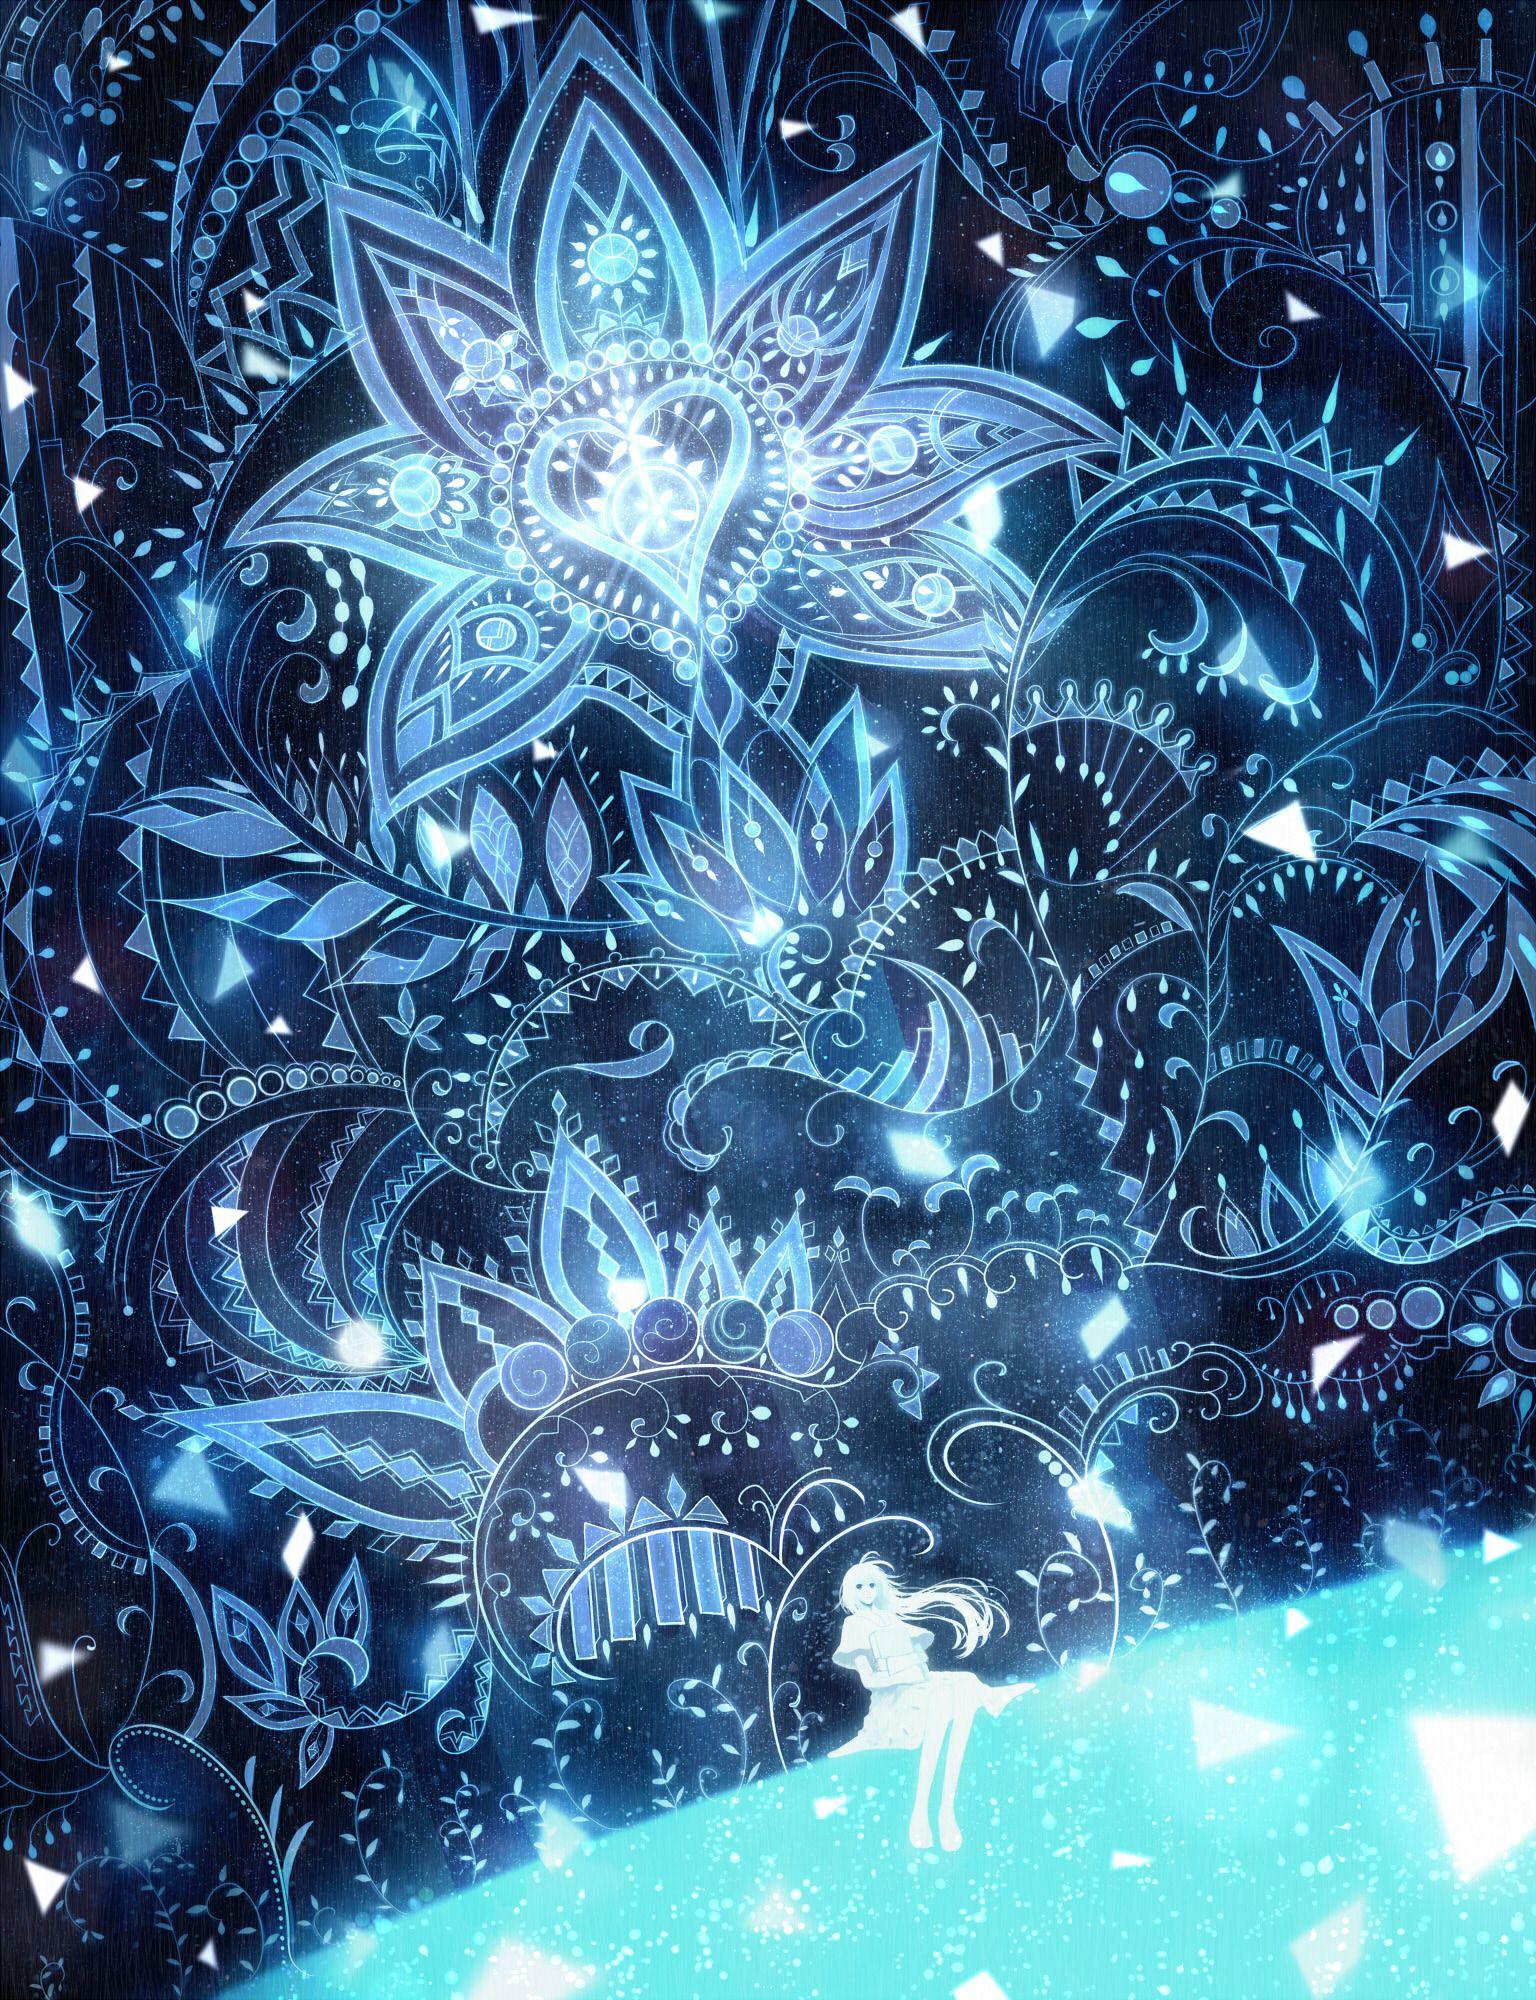 Anime Art Work の画像 投稿者 Hiep Ngo Tuan さん 壁紙アート